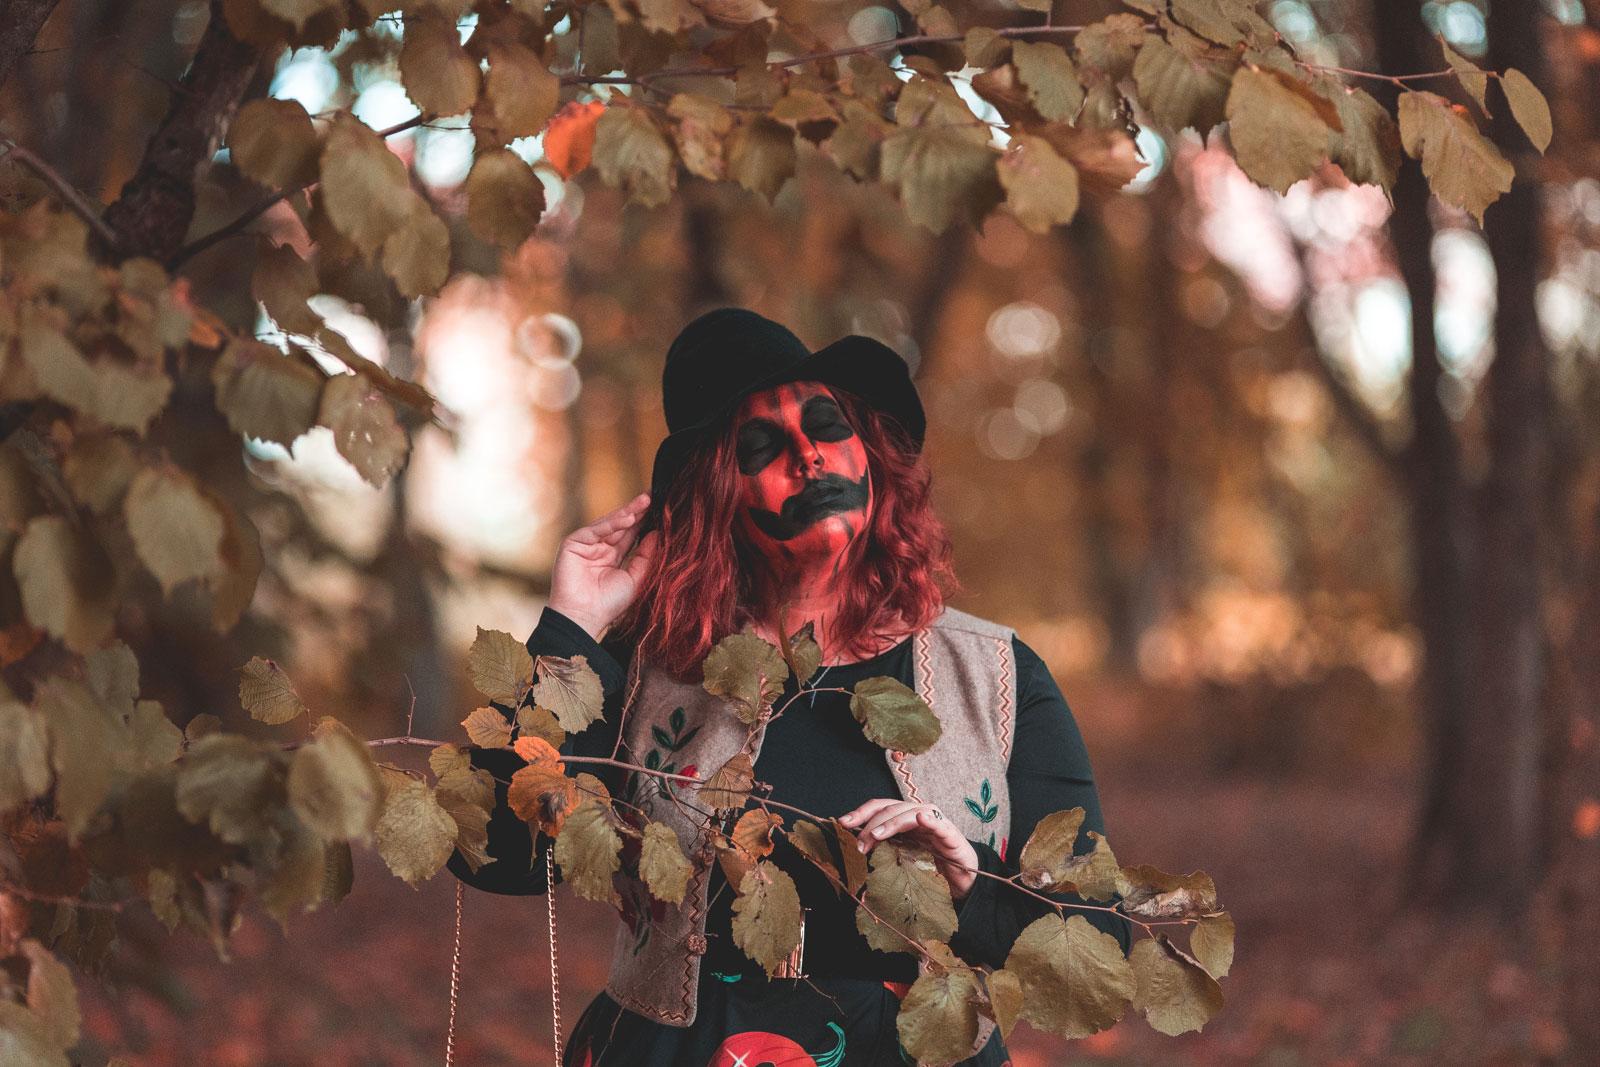 ninaah bulles, citrouilles, citrouille, halloween, sorciere, grande taille, dresslily, look, ginger hair, witch, dresslily plussize